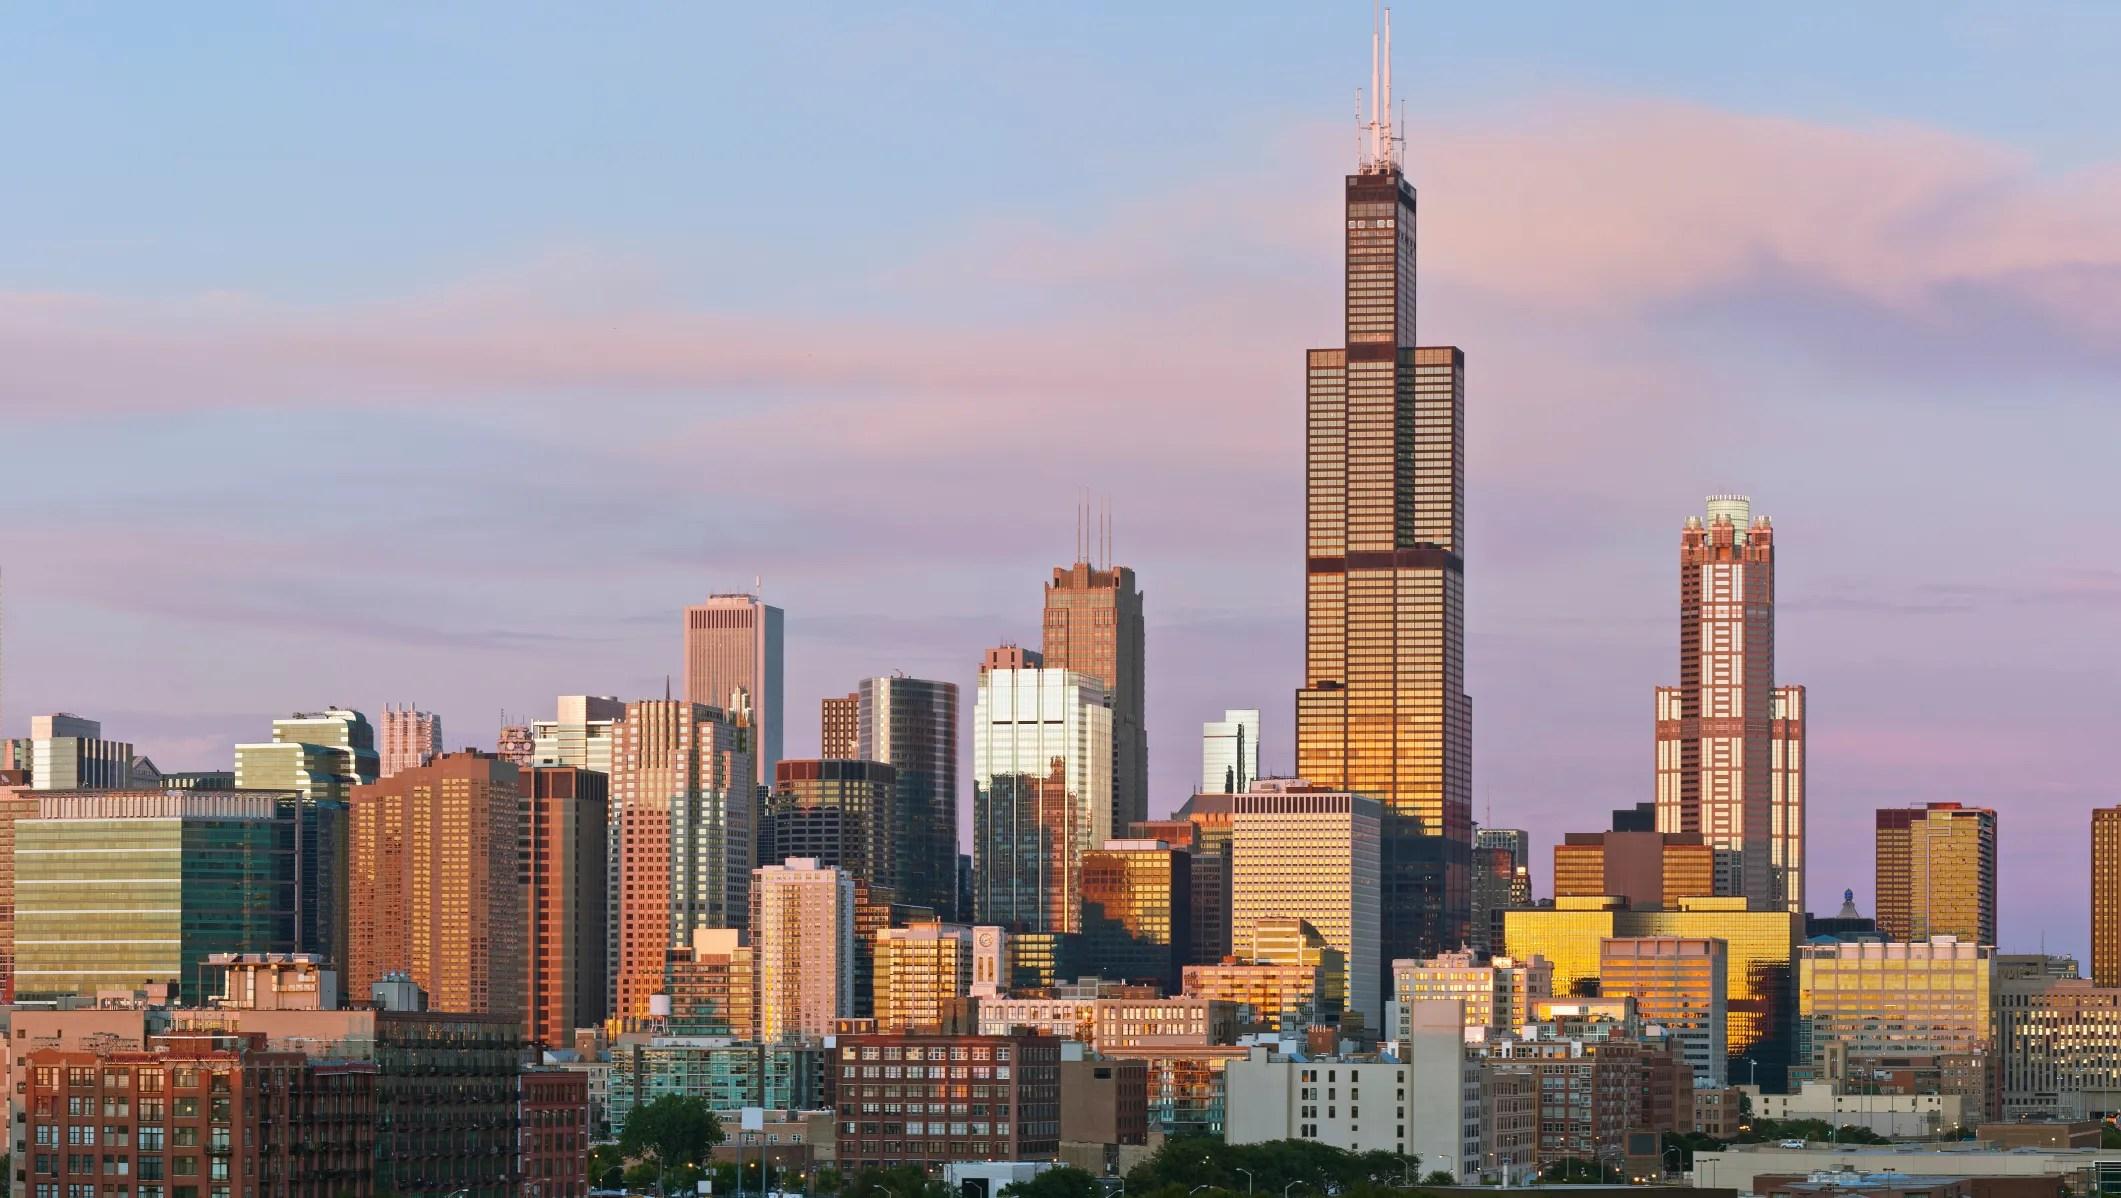 Chicago' Iconic Willis Tower